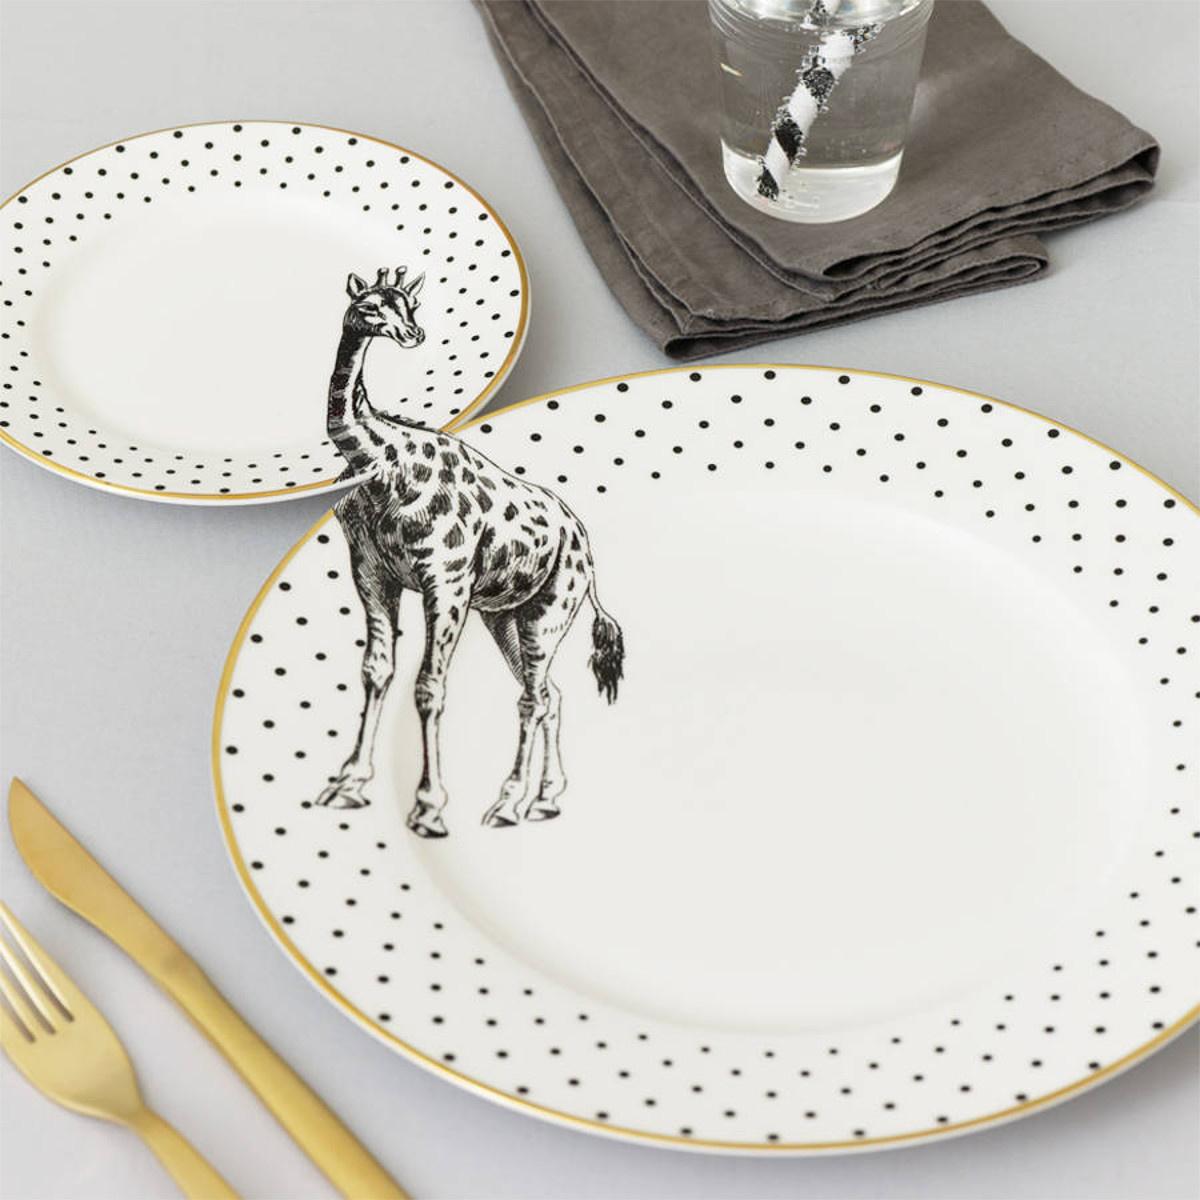 Yvonne Ellen Yvonne Ellen London Monochrome Set van 1 Diner Bord Ø 26,5 cm en 1 Salade Bord Ø 16 cm - Giraffe Print - Bone China Porselein - In prachtige Geschenkdoos